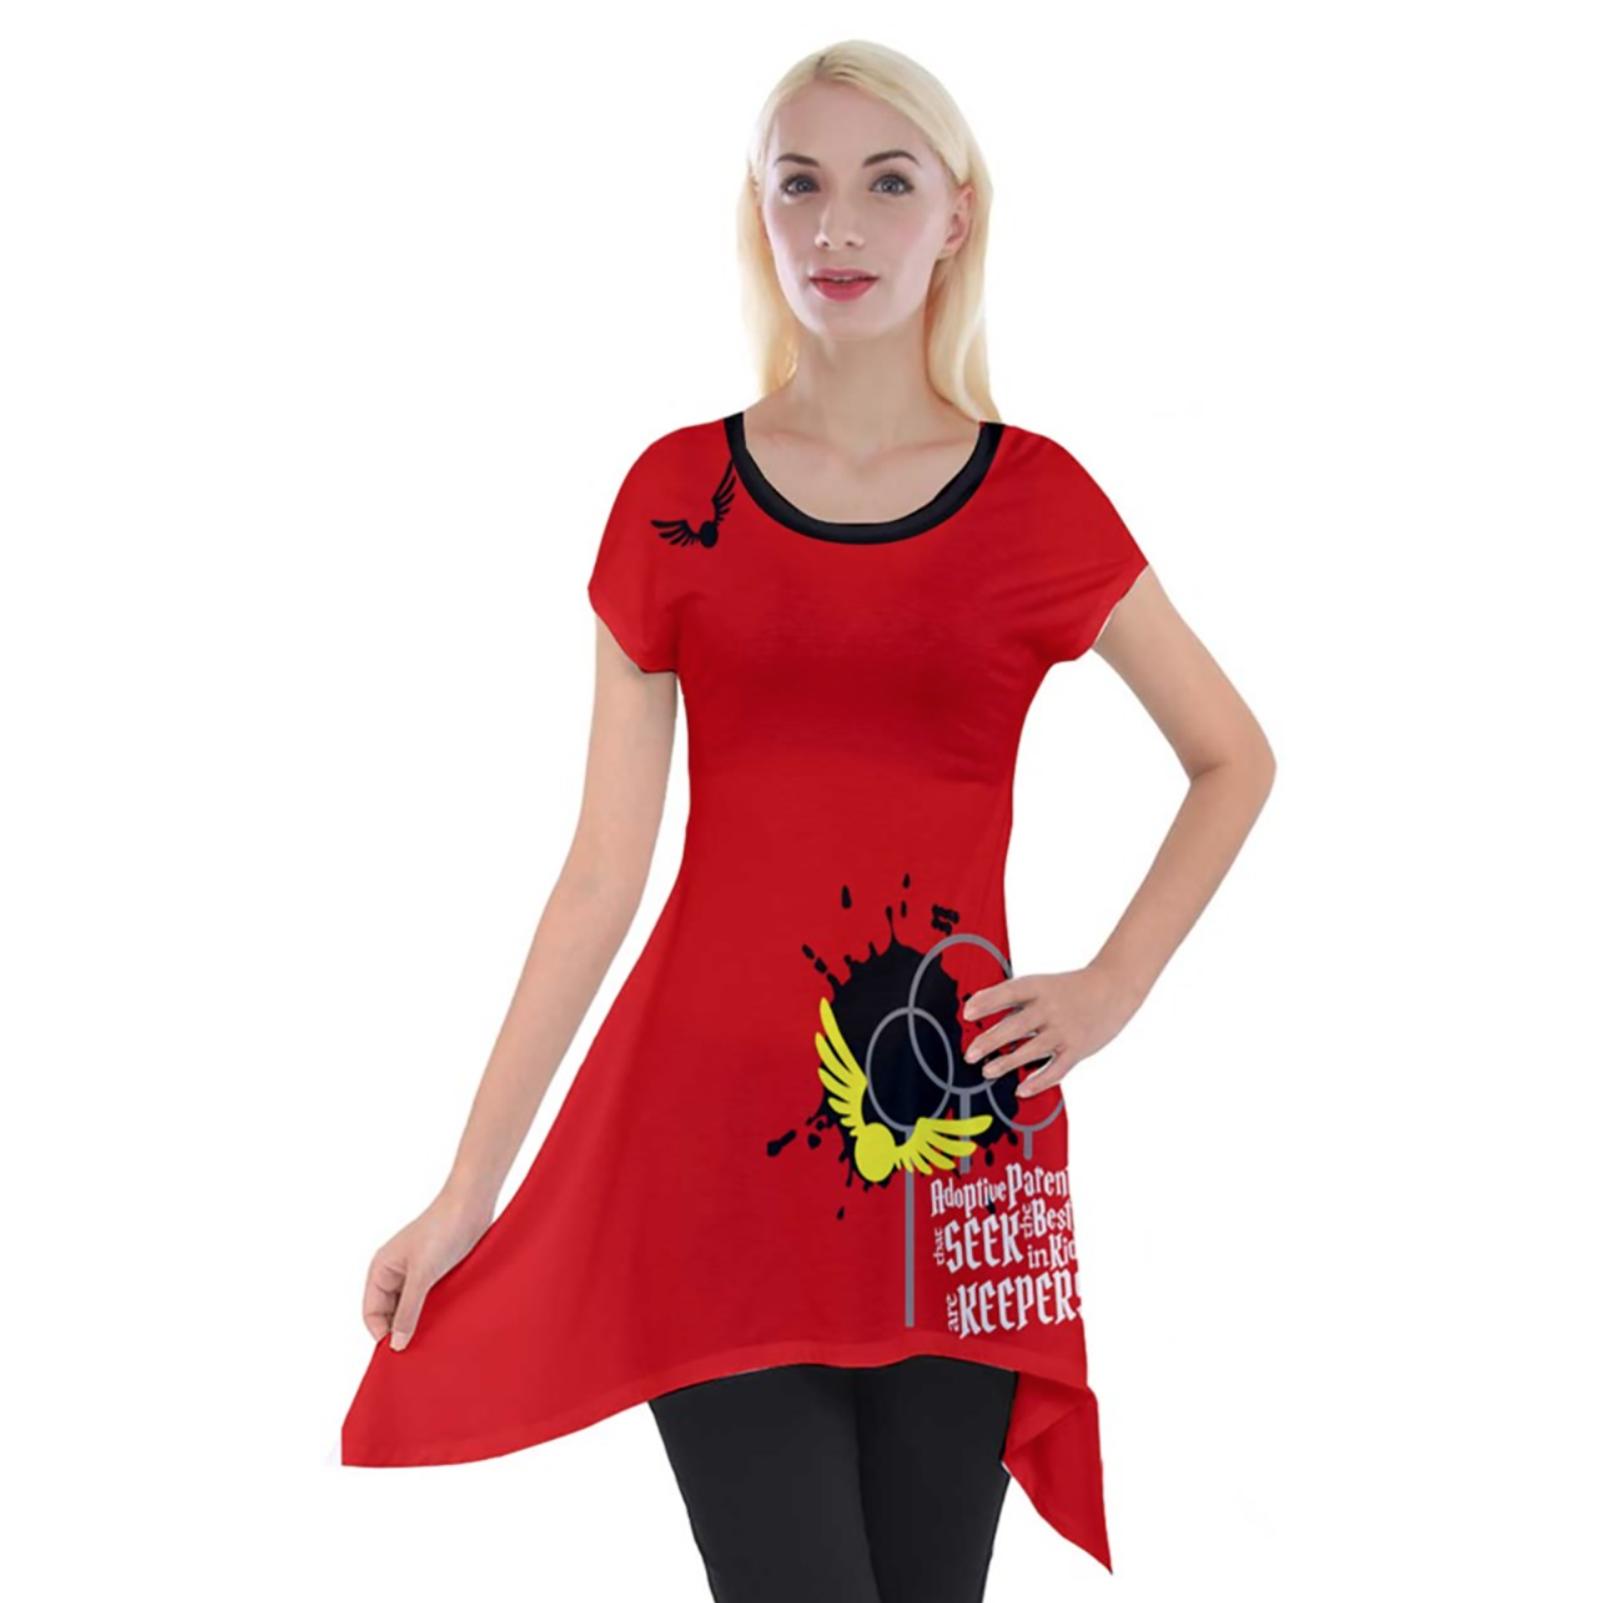 Magical Sports Design Women's Short Sleeve Side Drop Tunic